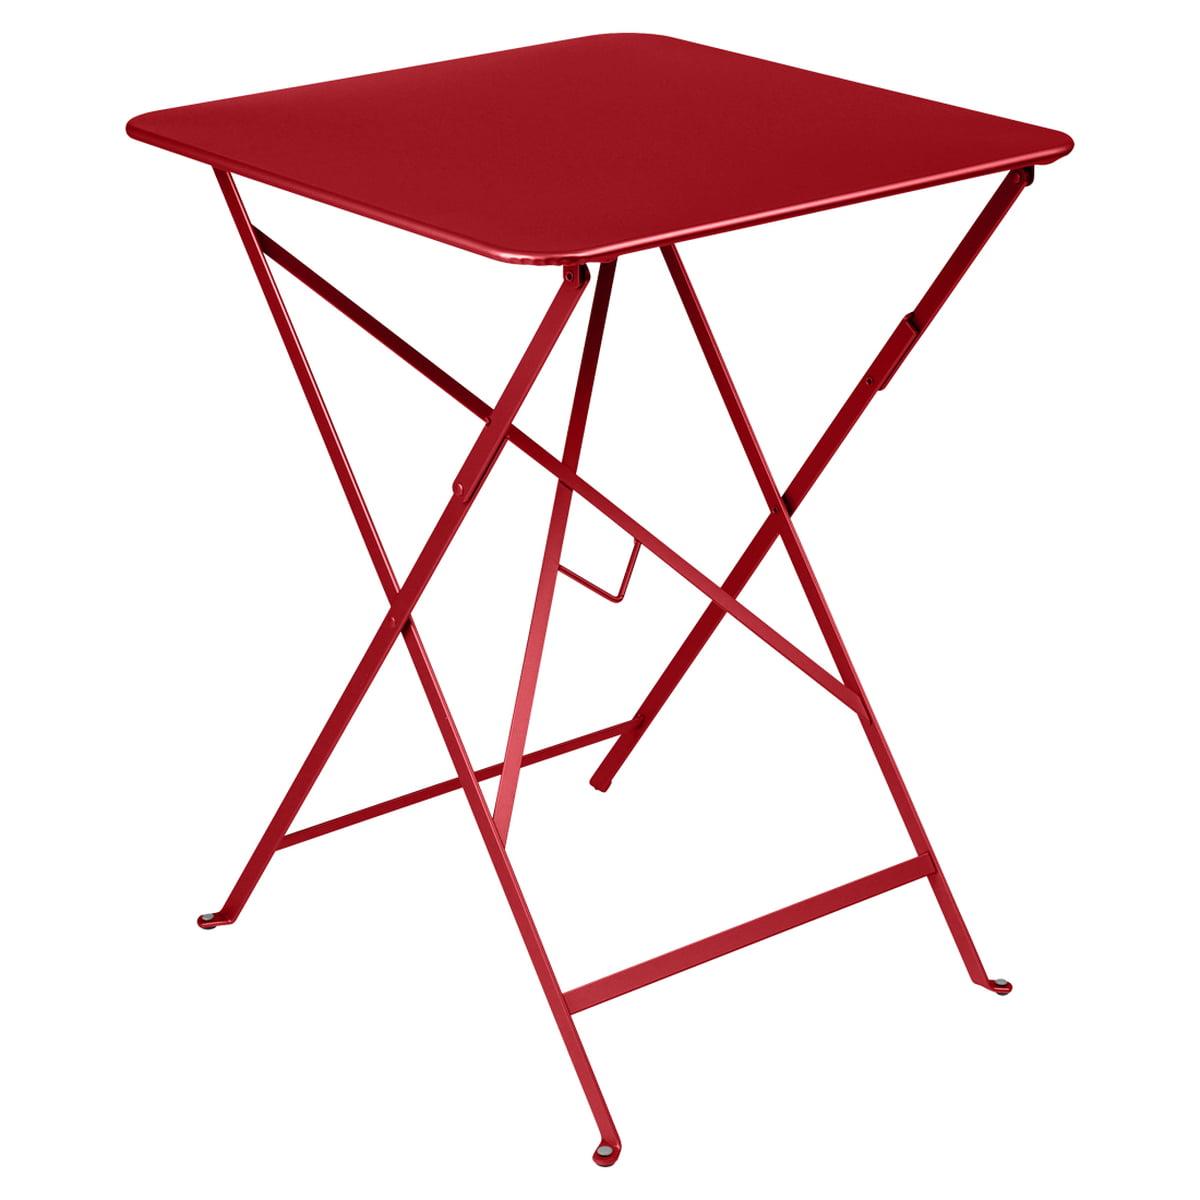 Fermob - Table pliante Bistro 57 x 57 cm, blanc coton